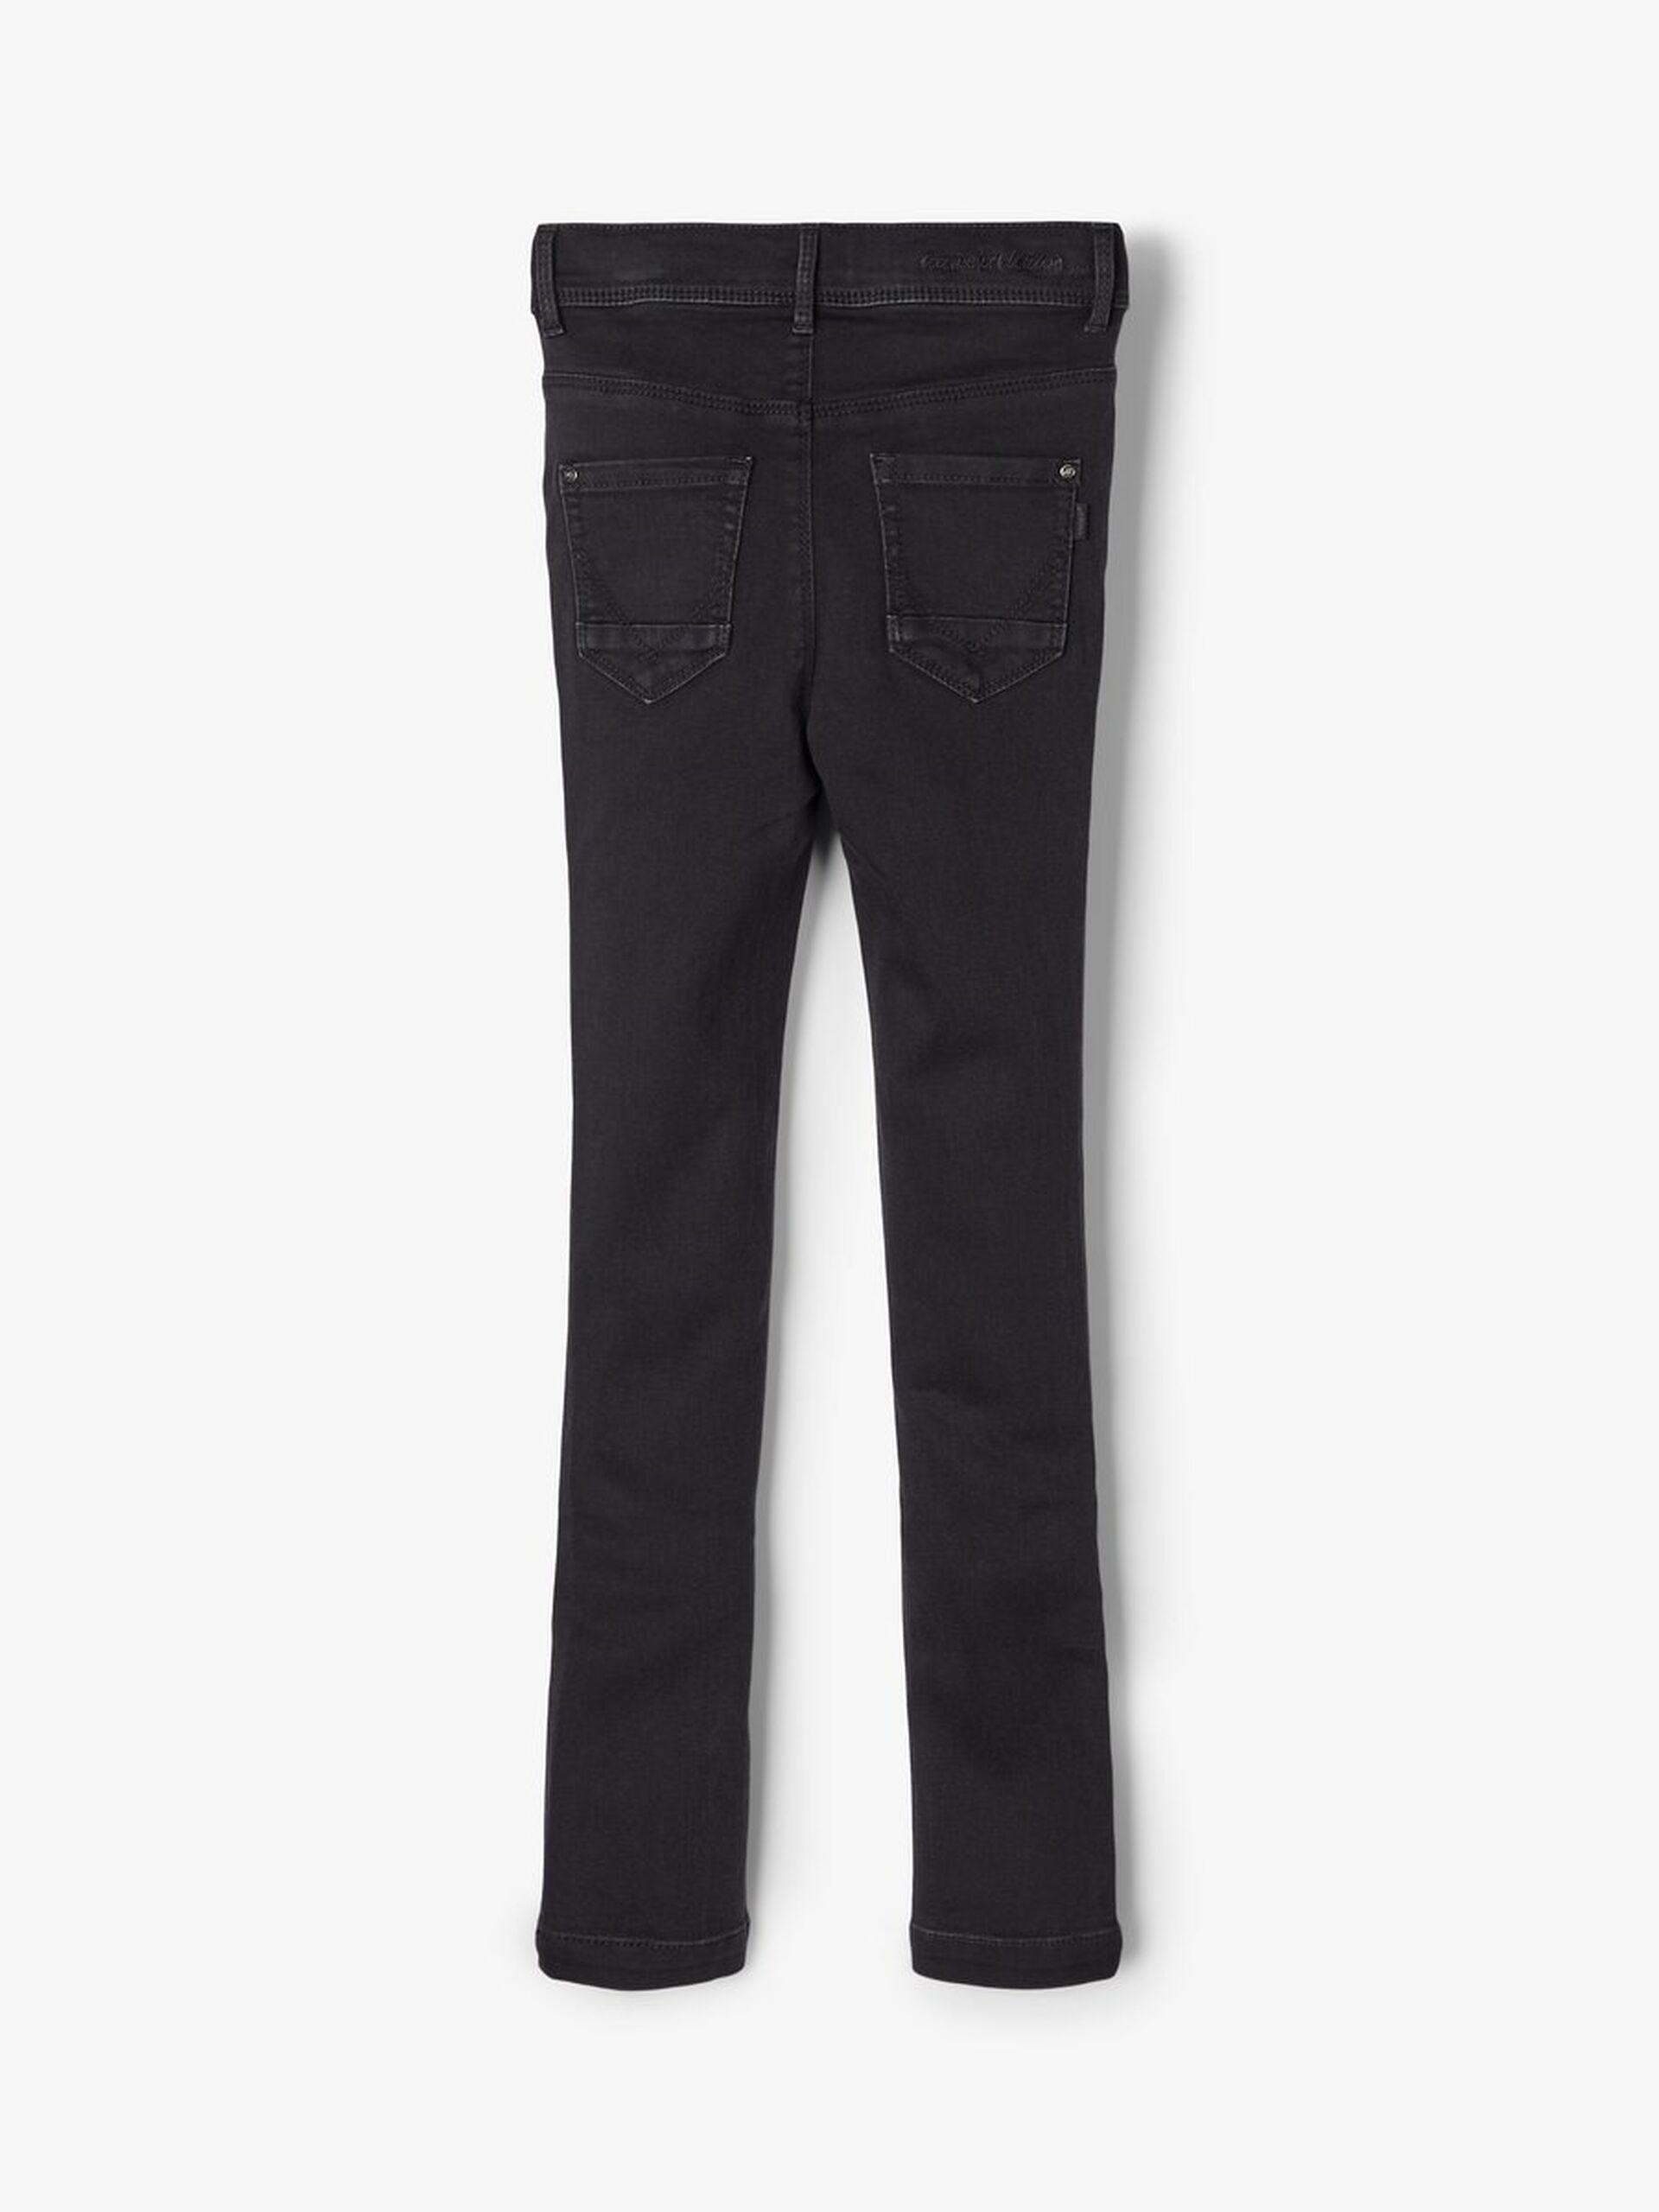 NAME IT Jeans Hose NKMRyan DNMCore schwarz regular Größe 128 bis 164